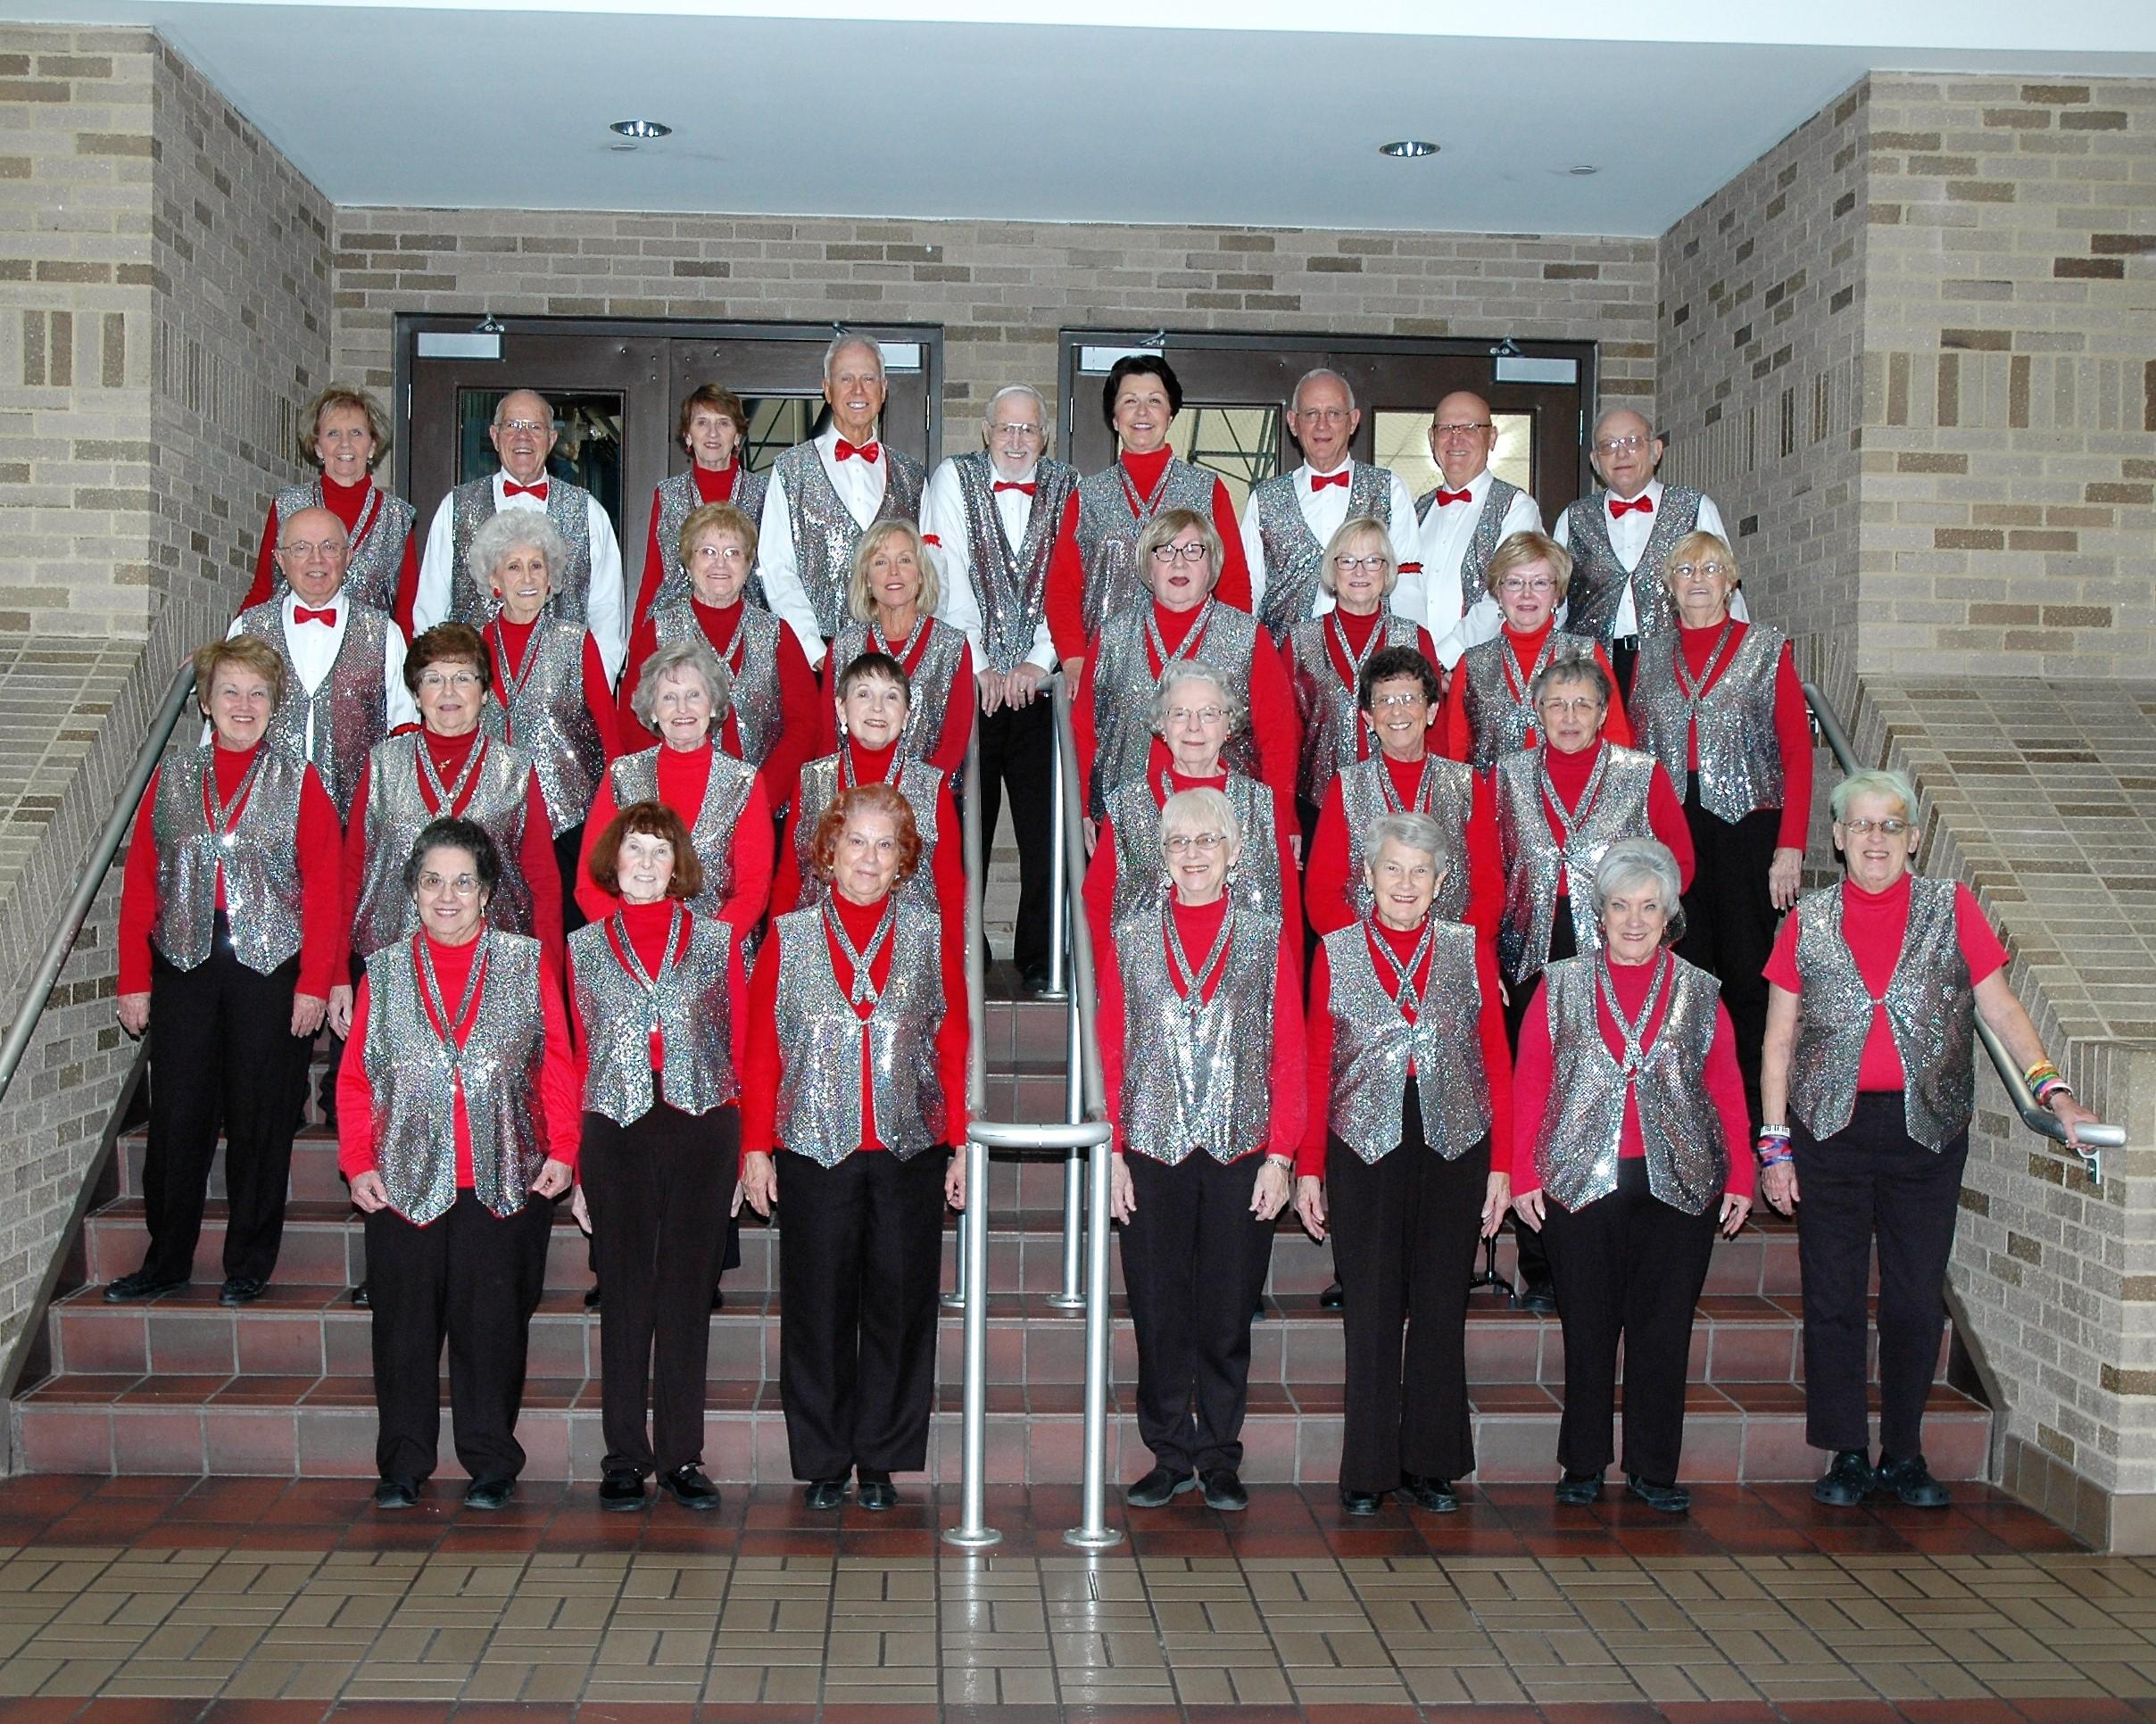 Kettering senior show choir